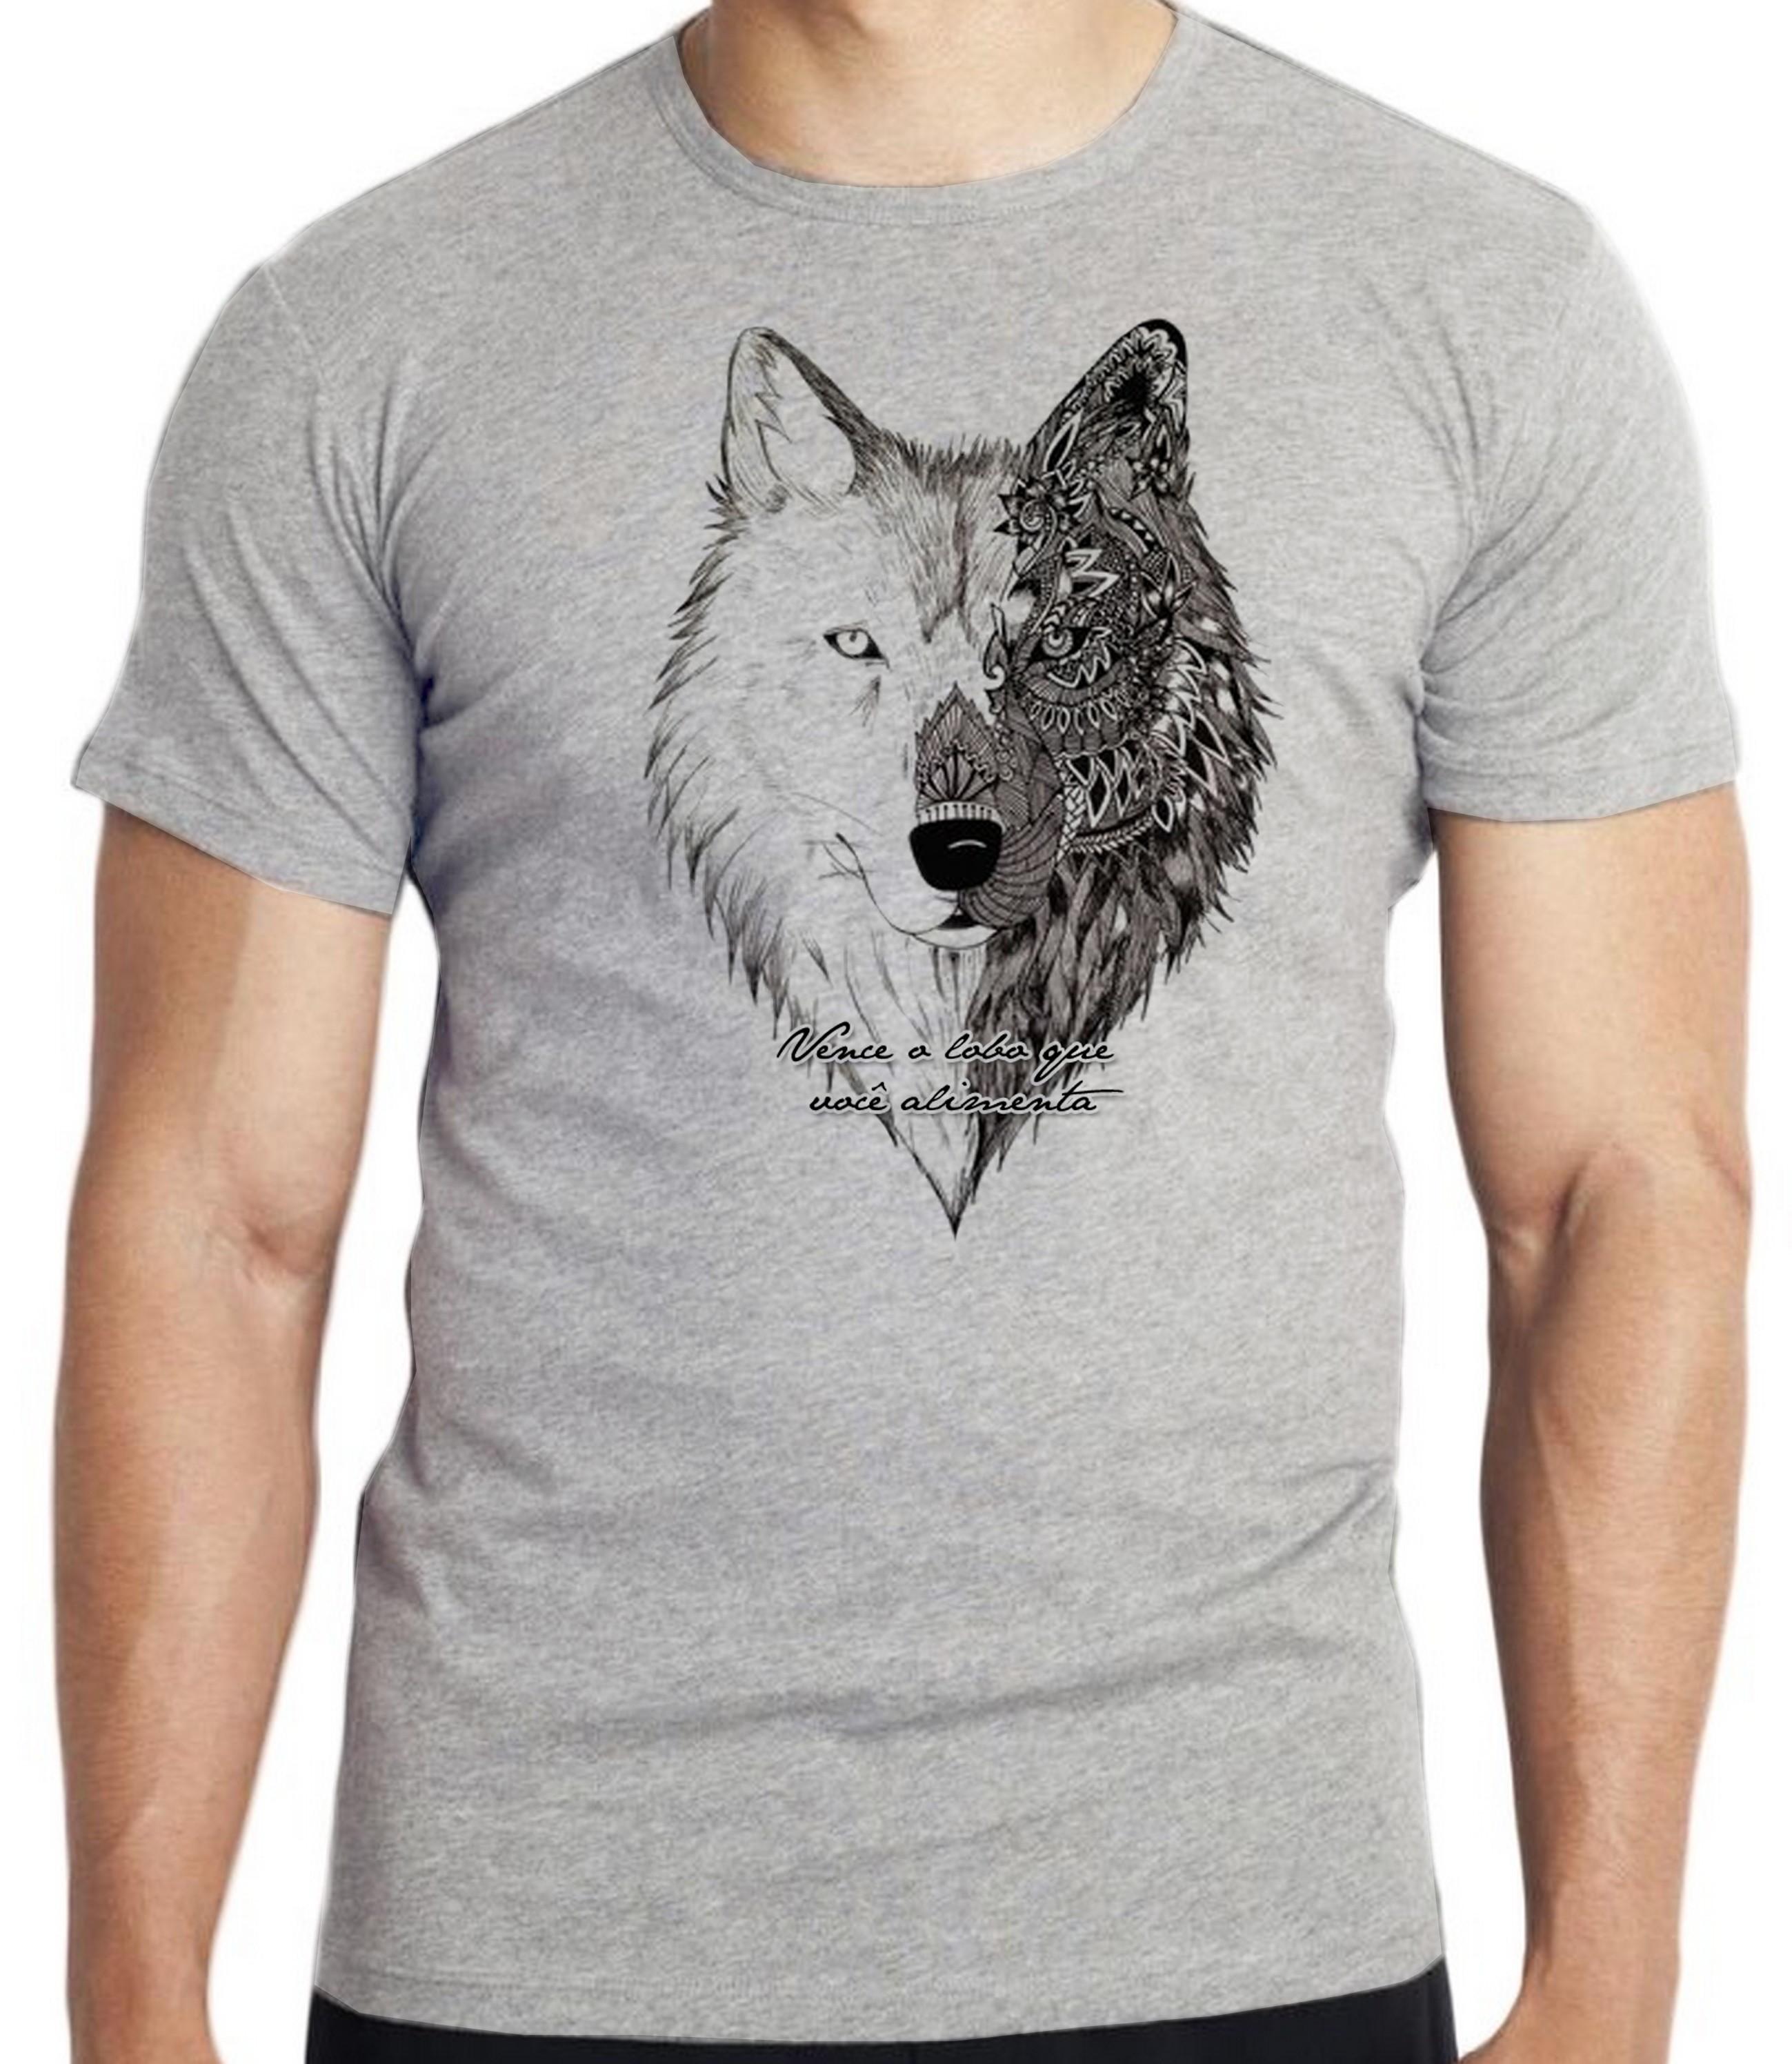 feea01edb3 Camiseta Feminina Pet Dog Raglan Camisa Feminina Cao